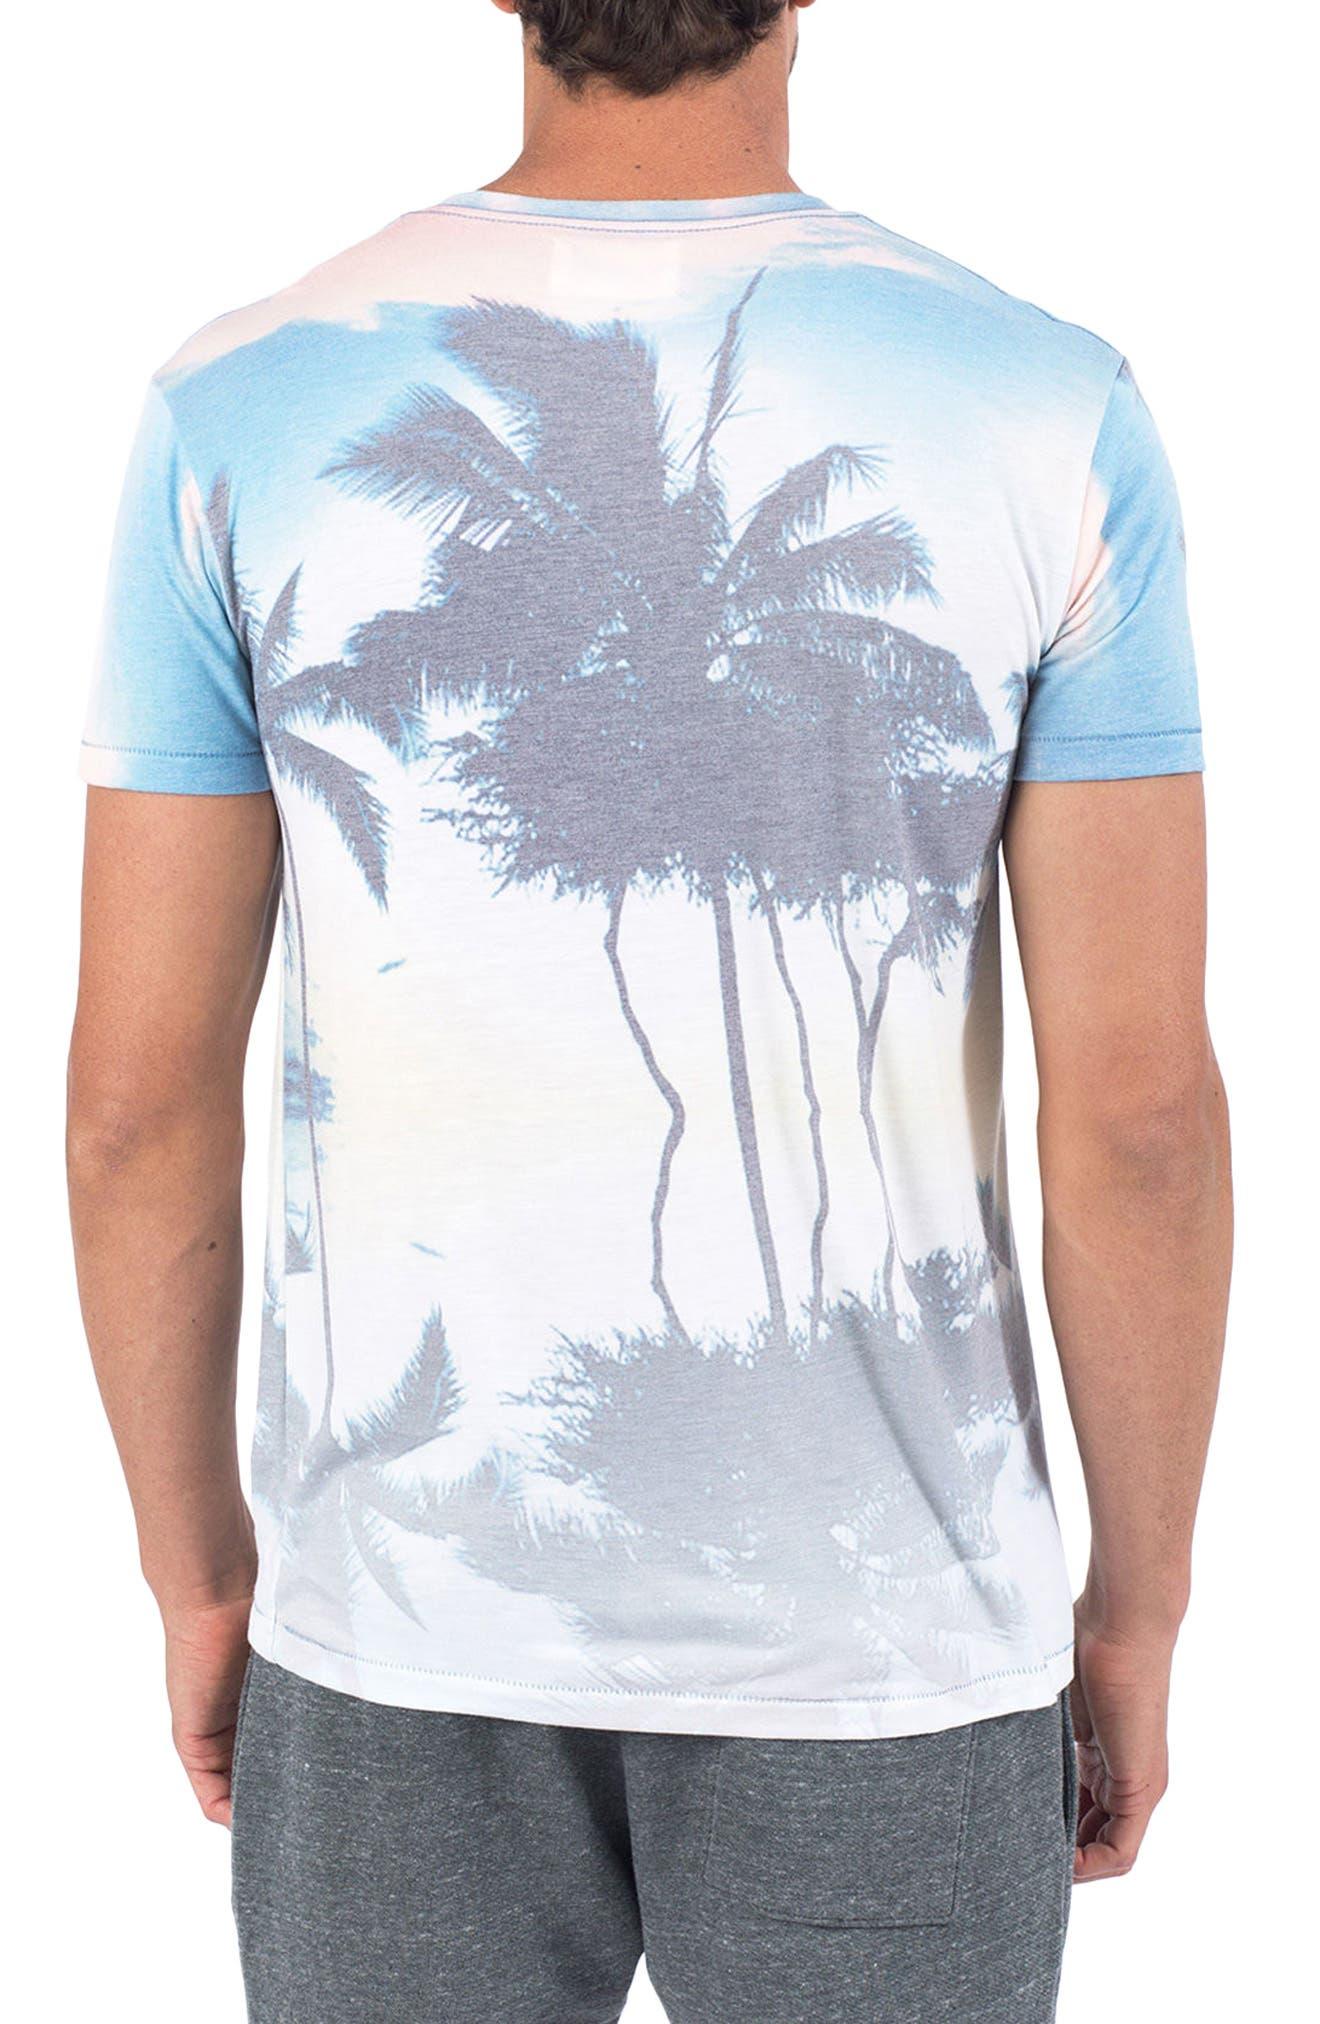 Off Tropic T-Shirt,                             Alternate thumbnail 2, color,                             OFF TROPIC